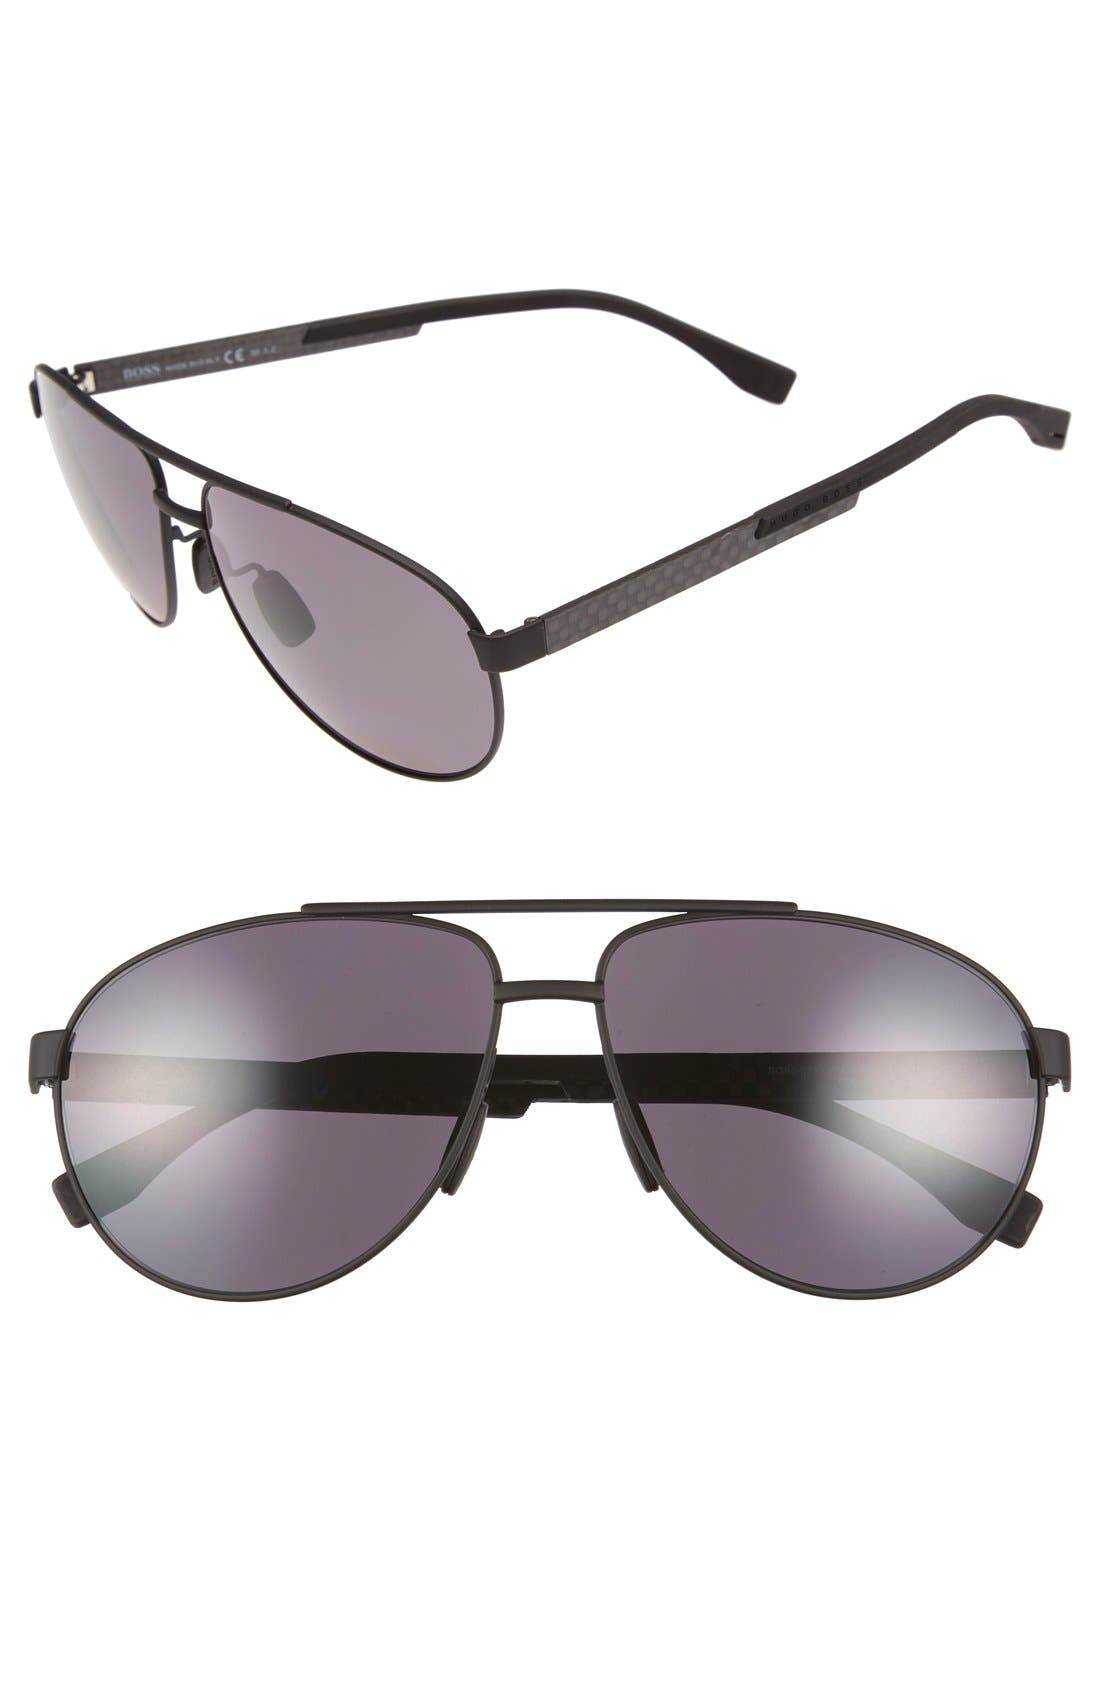 63mm Polarized Sunglasses,                             Main thumbnail 1, color,                             001